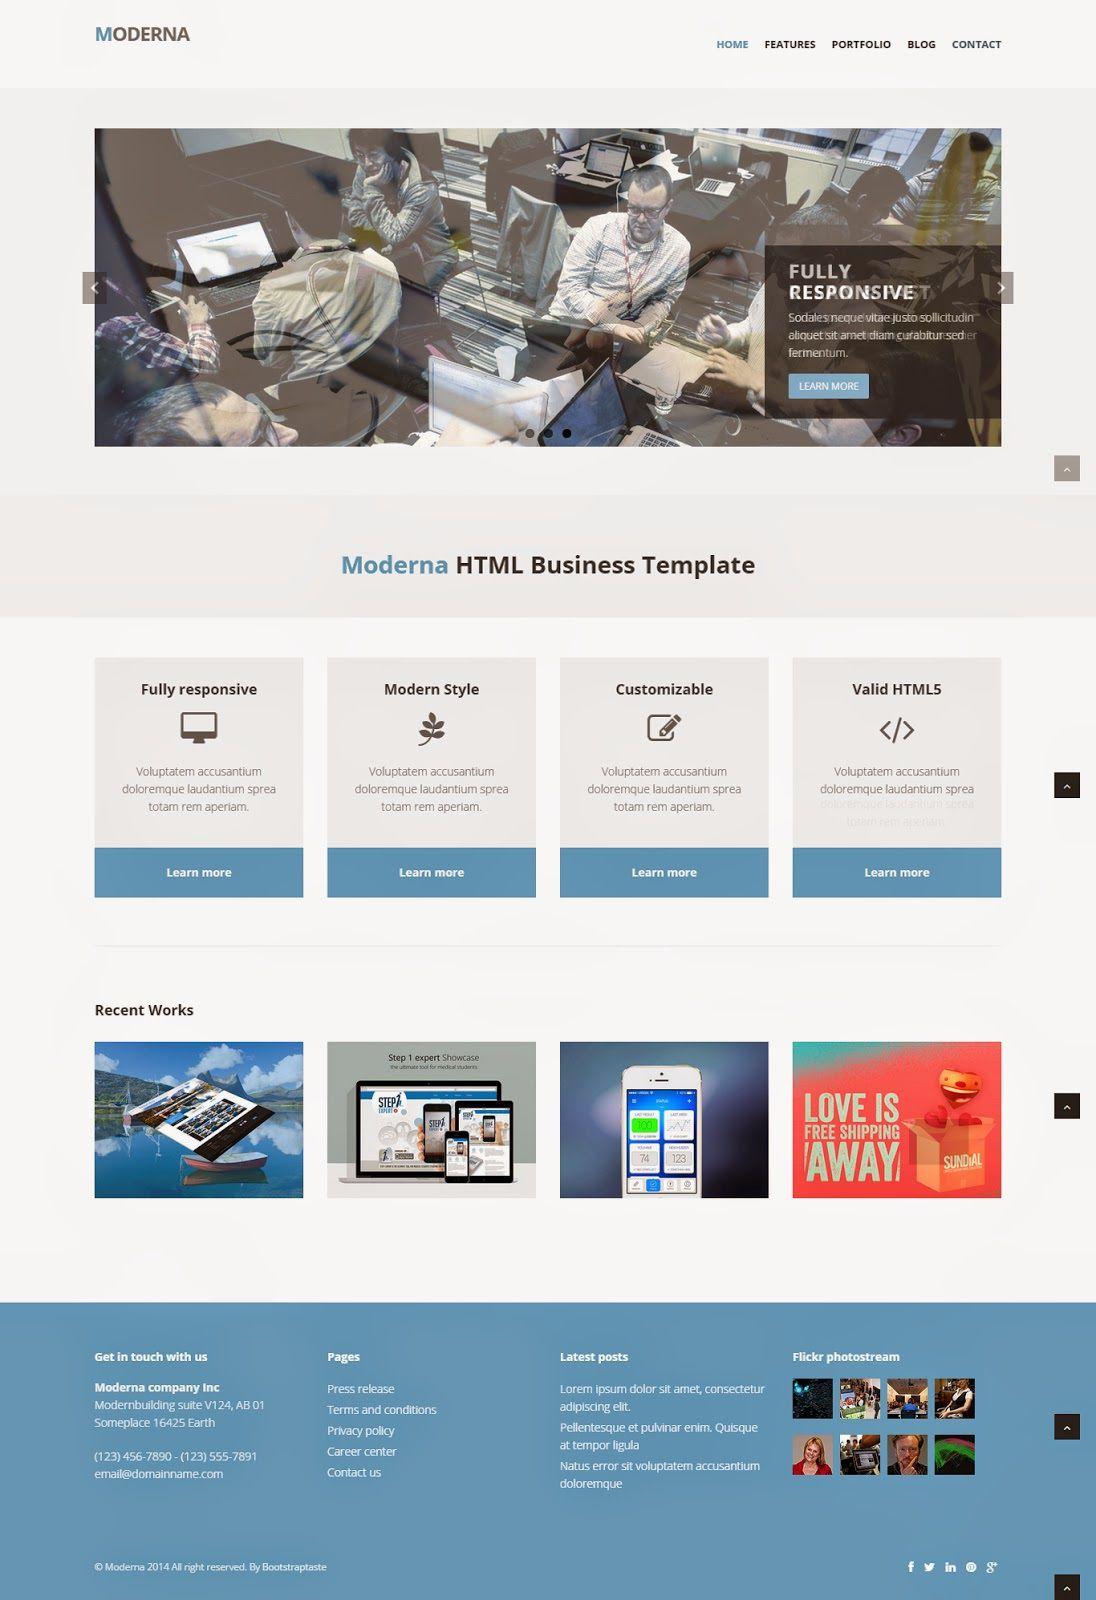 008 Fascinating Web Page Design Template In Asp Net Sample  Asp.netFull